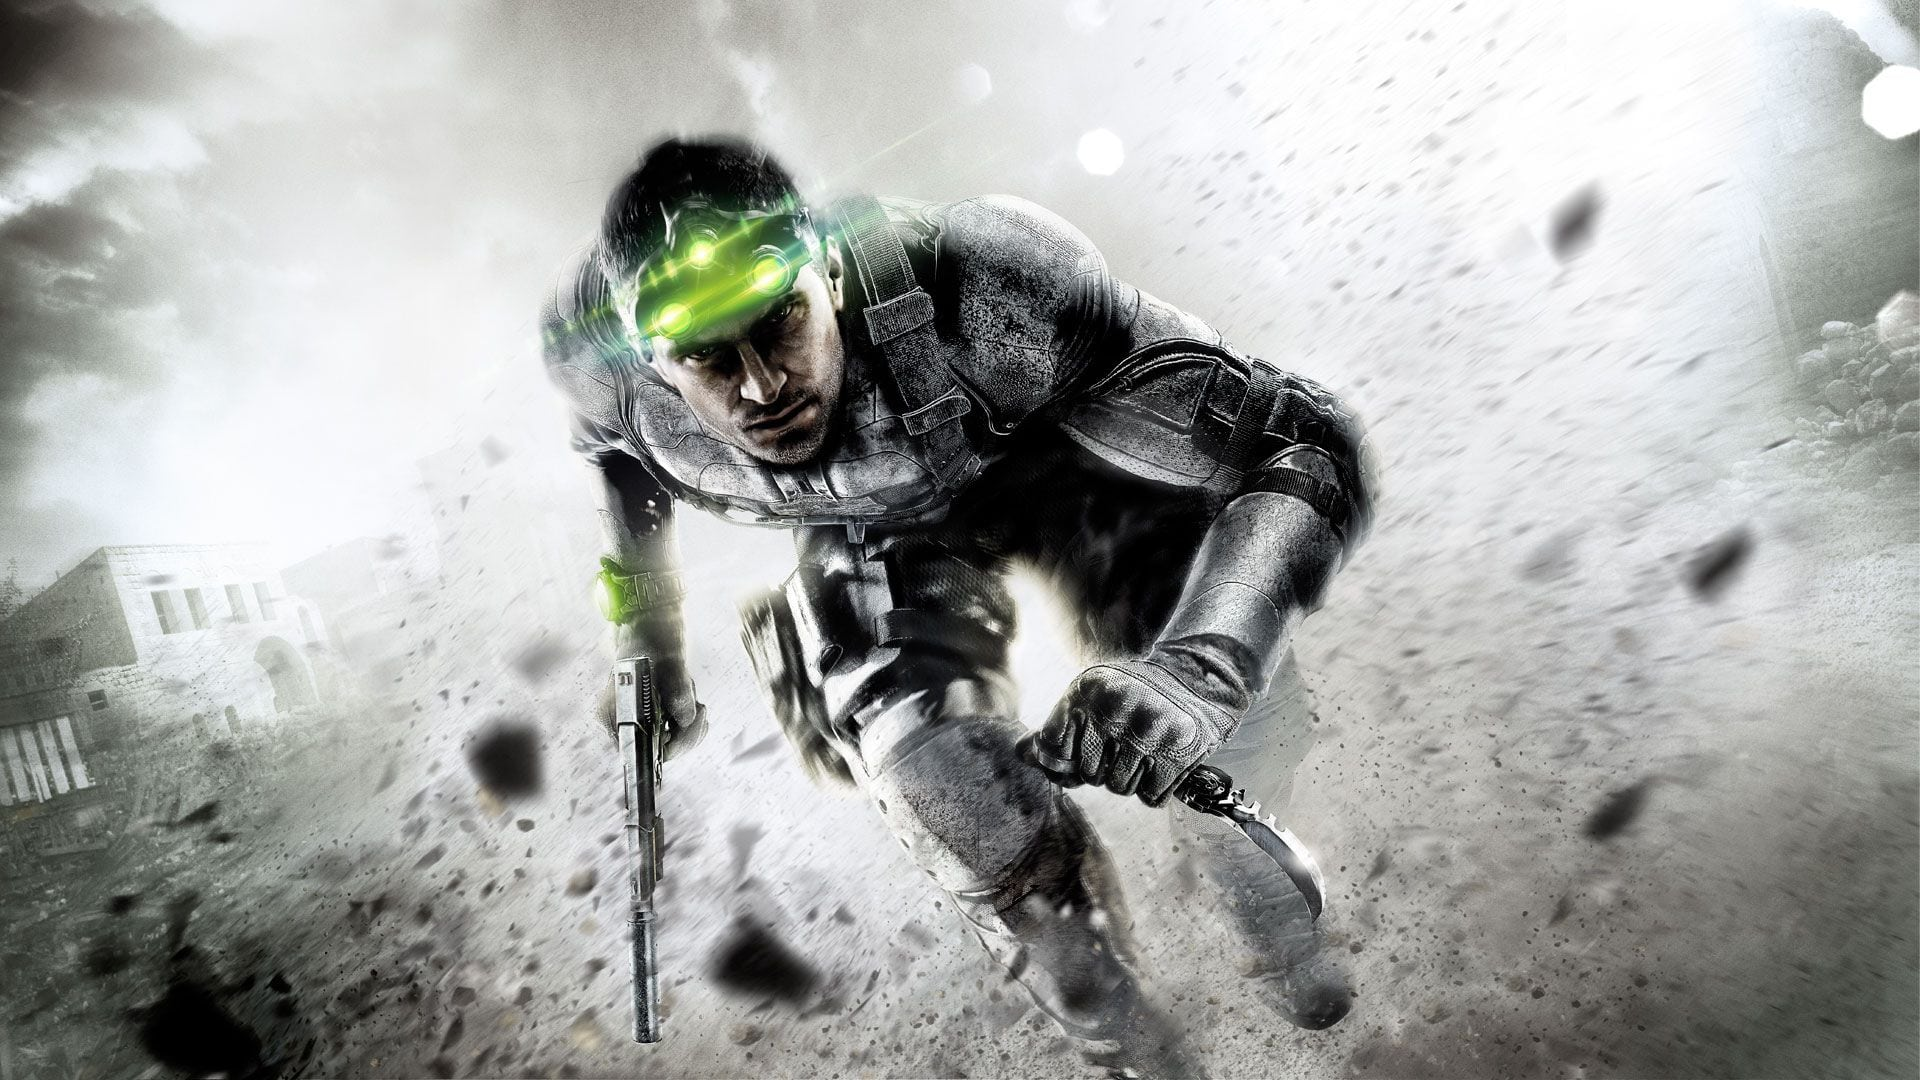 next Splinter Cell game